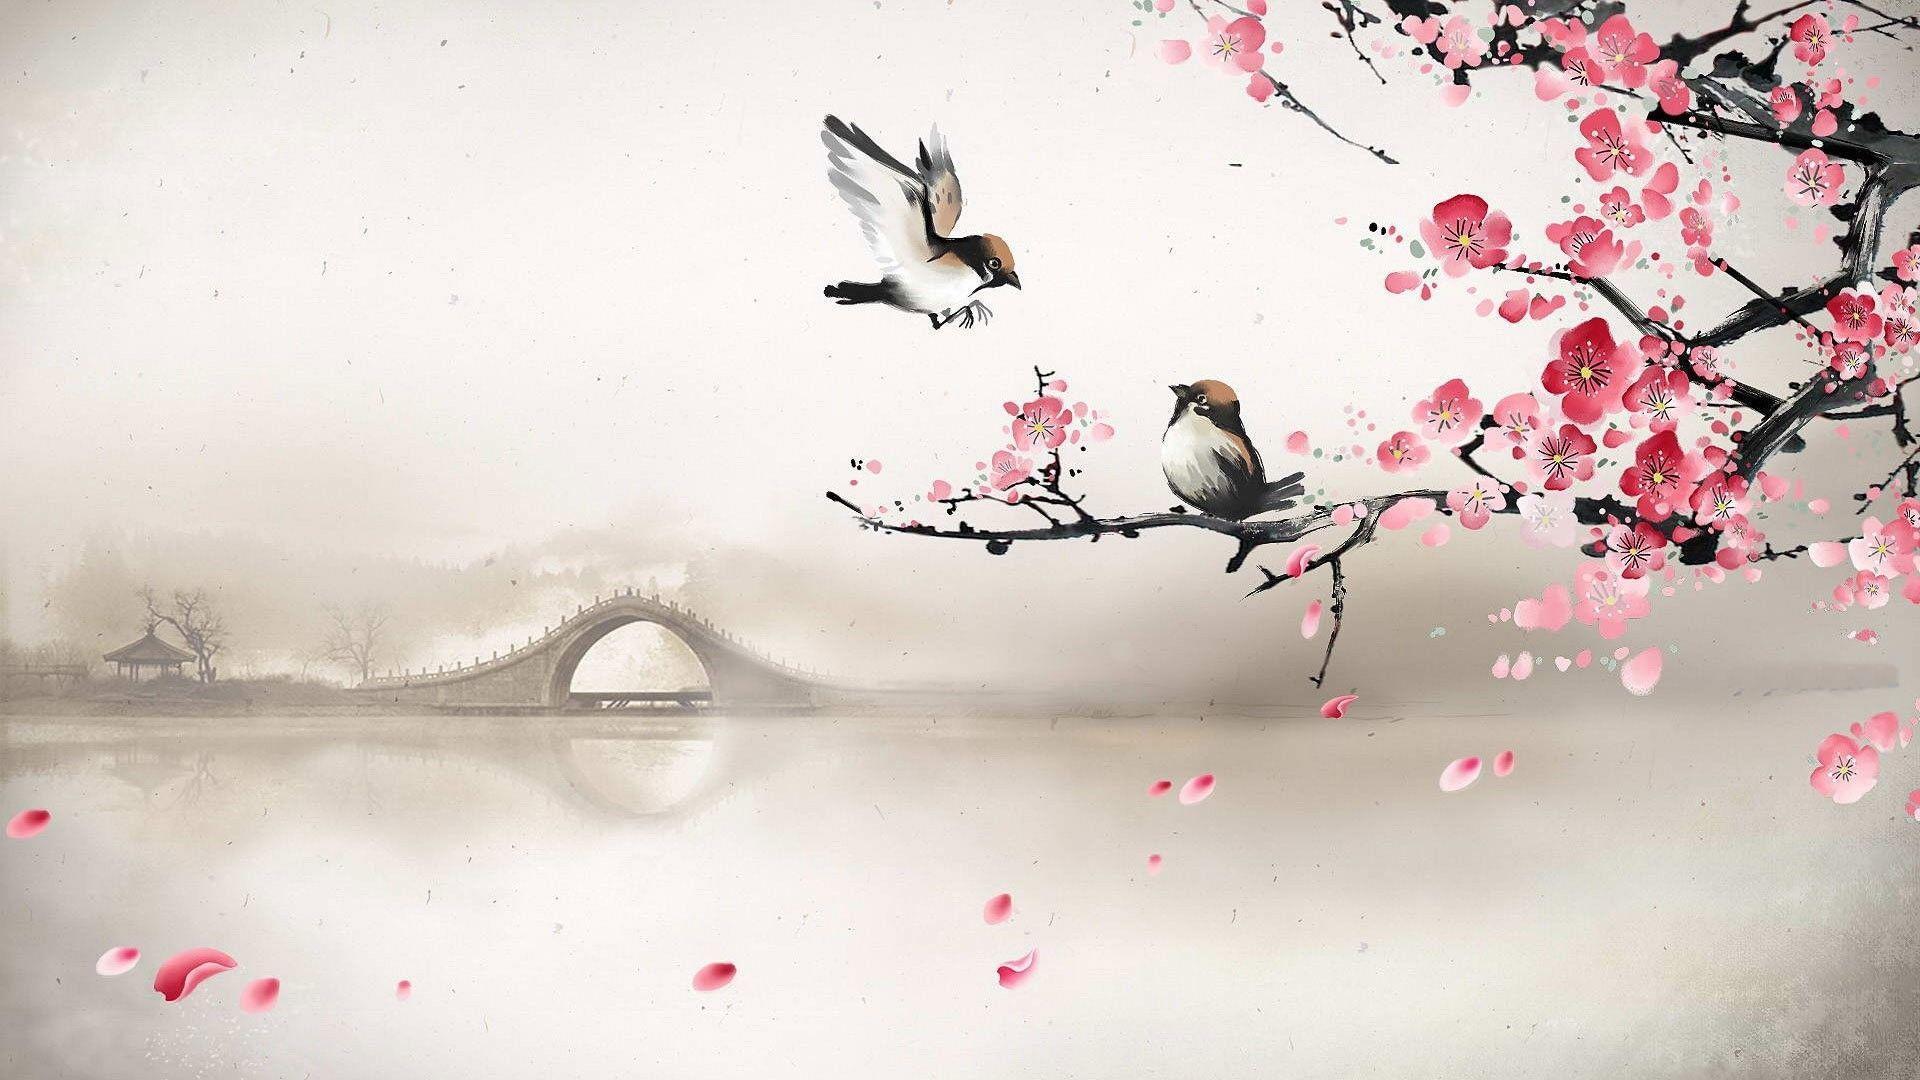 Asian Art Wallpapers Top Free Asian Art Backgrounds Wallpaperaccess